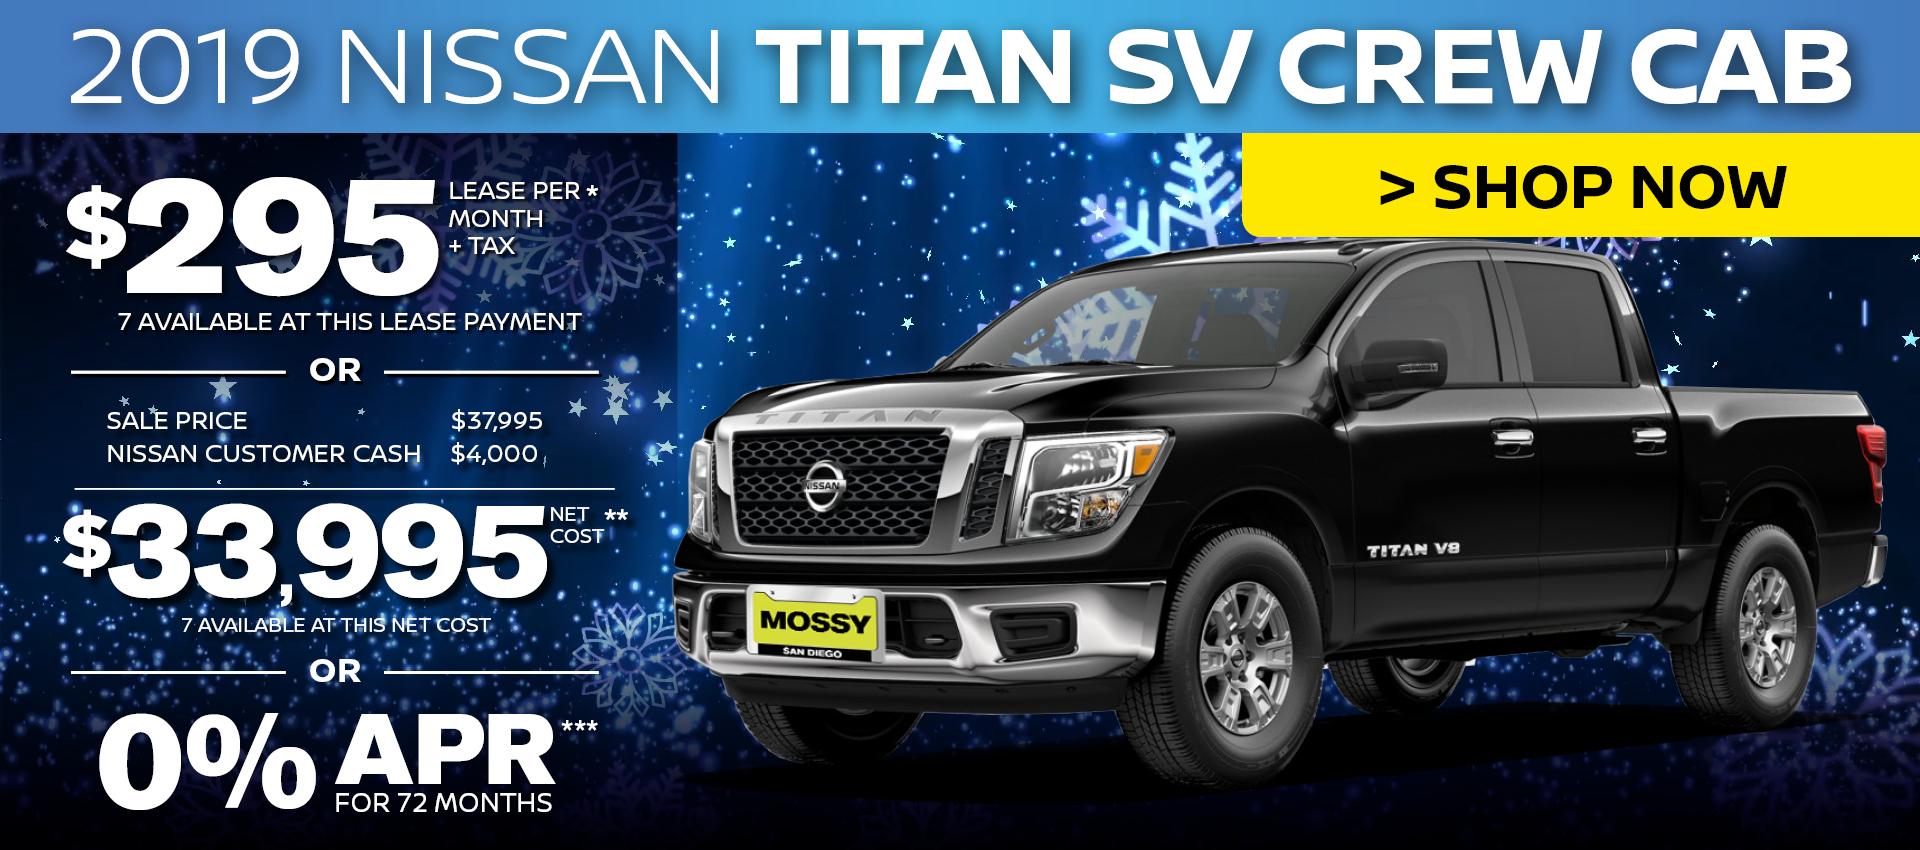 Mossy Nissan - Nissan Titan Purchase HP